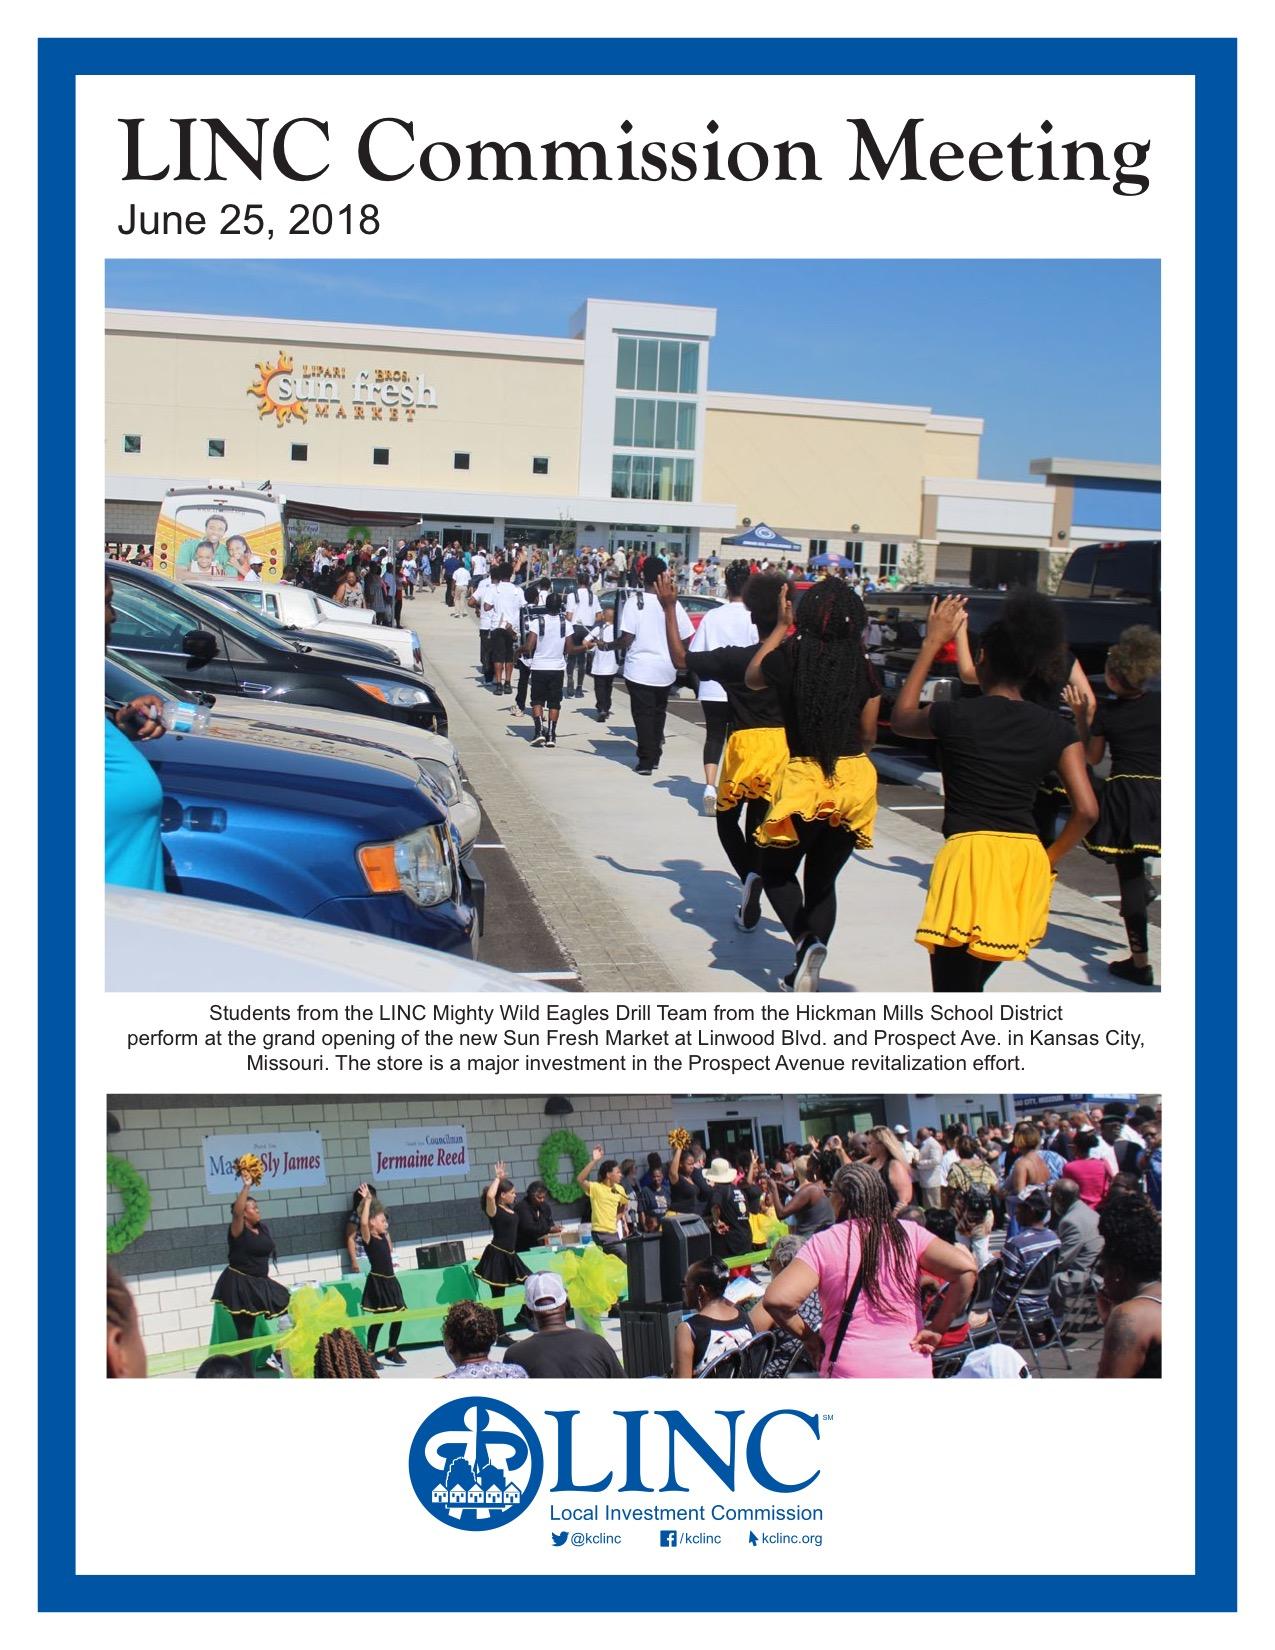 LINC Commission Meeting June 2018